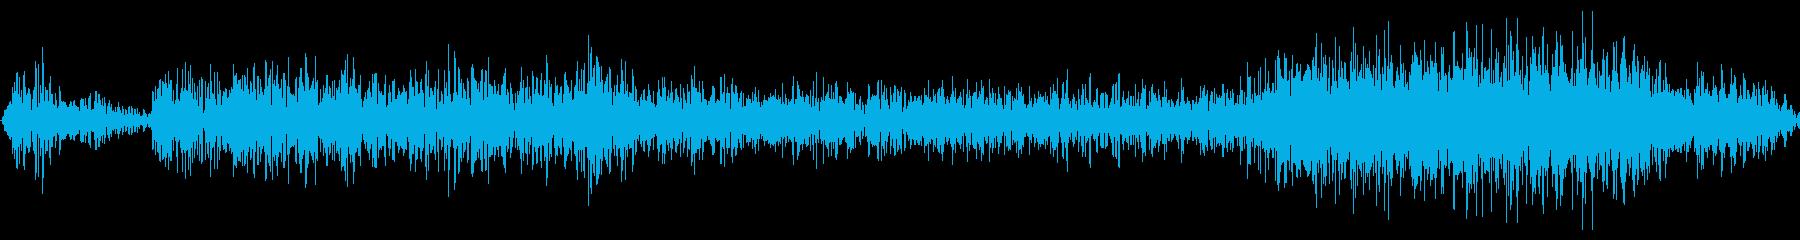 SciFi EC01_91_3の再生済みの波形